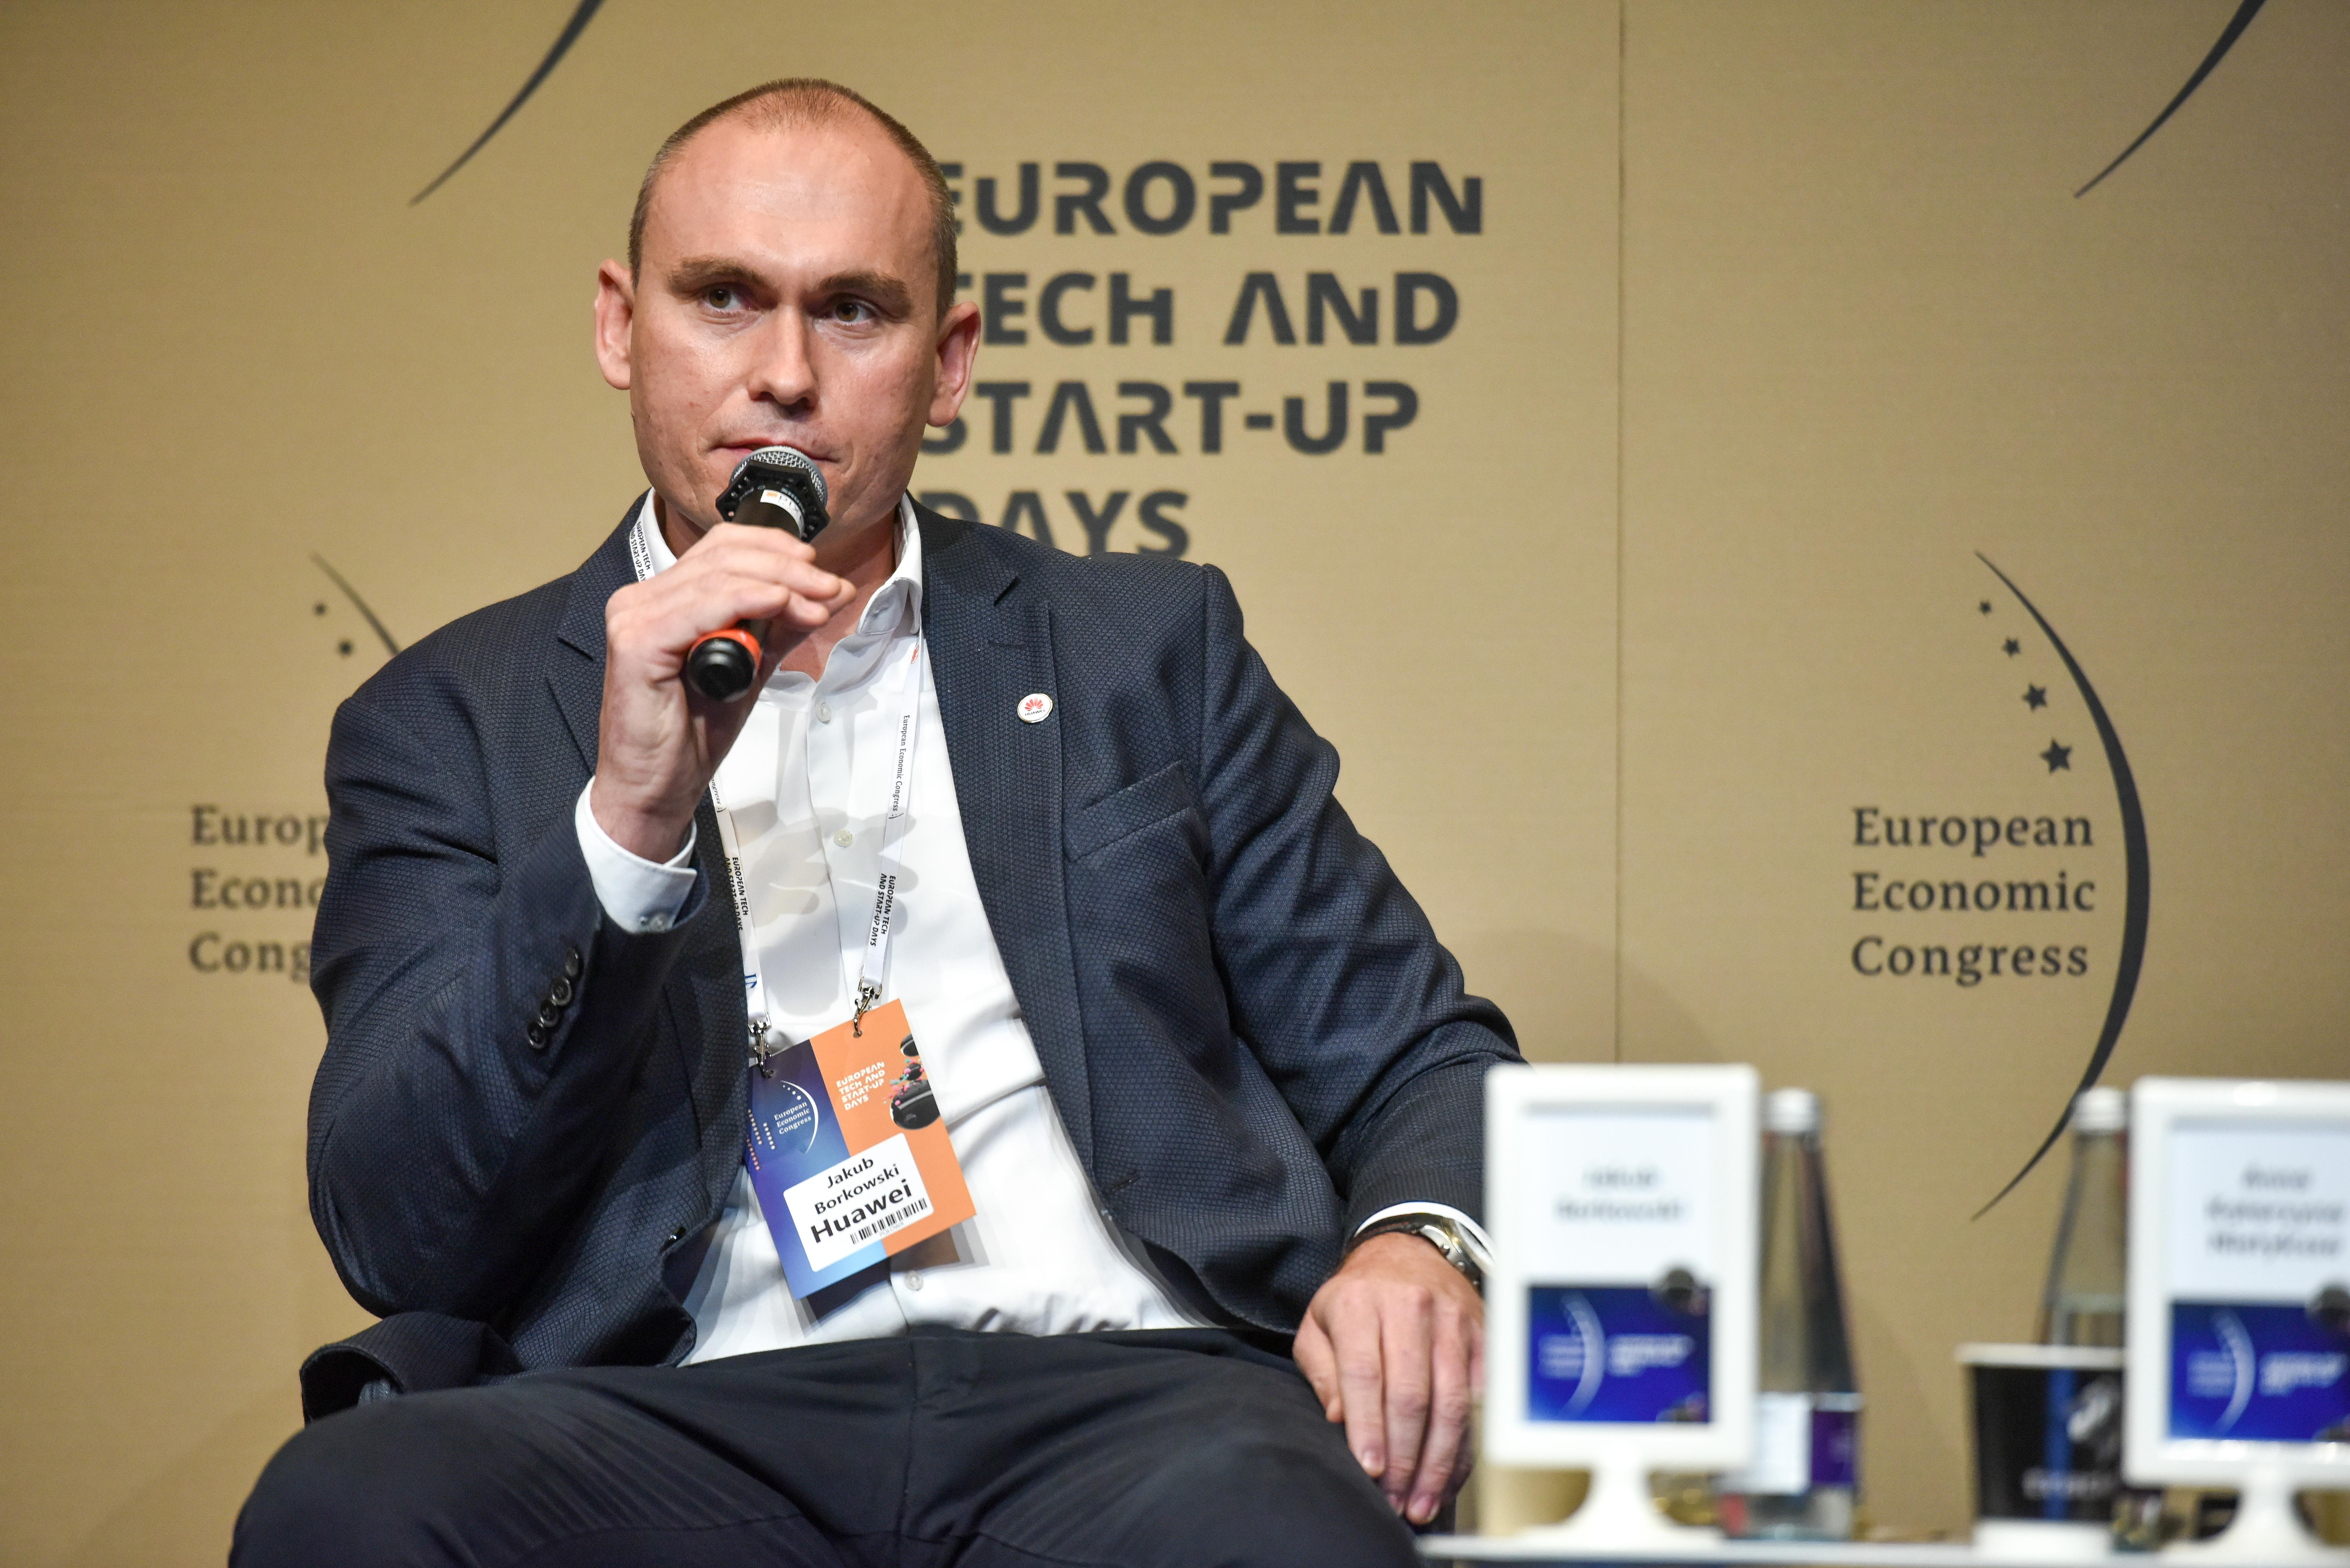 Jakub Borkowski - business development director and 5G wireless solution architect for CEE & Nordic Region Huawei (Fot. PTWP)